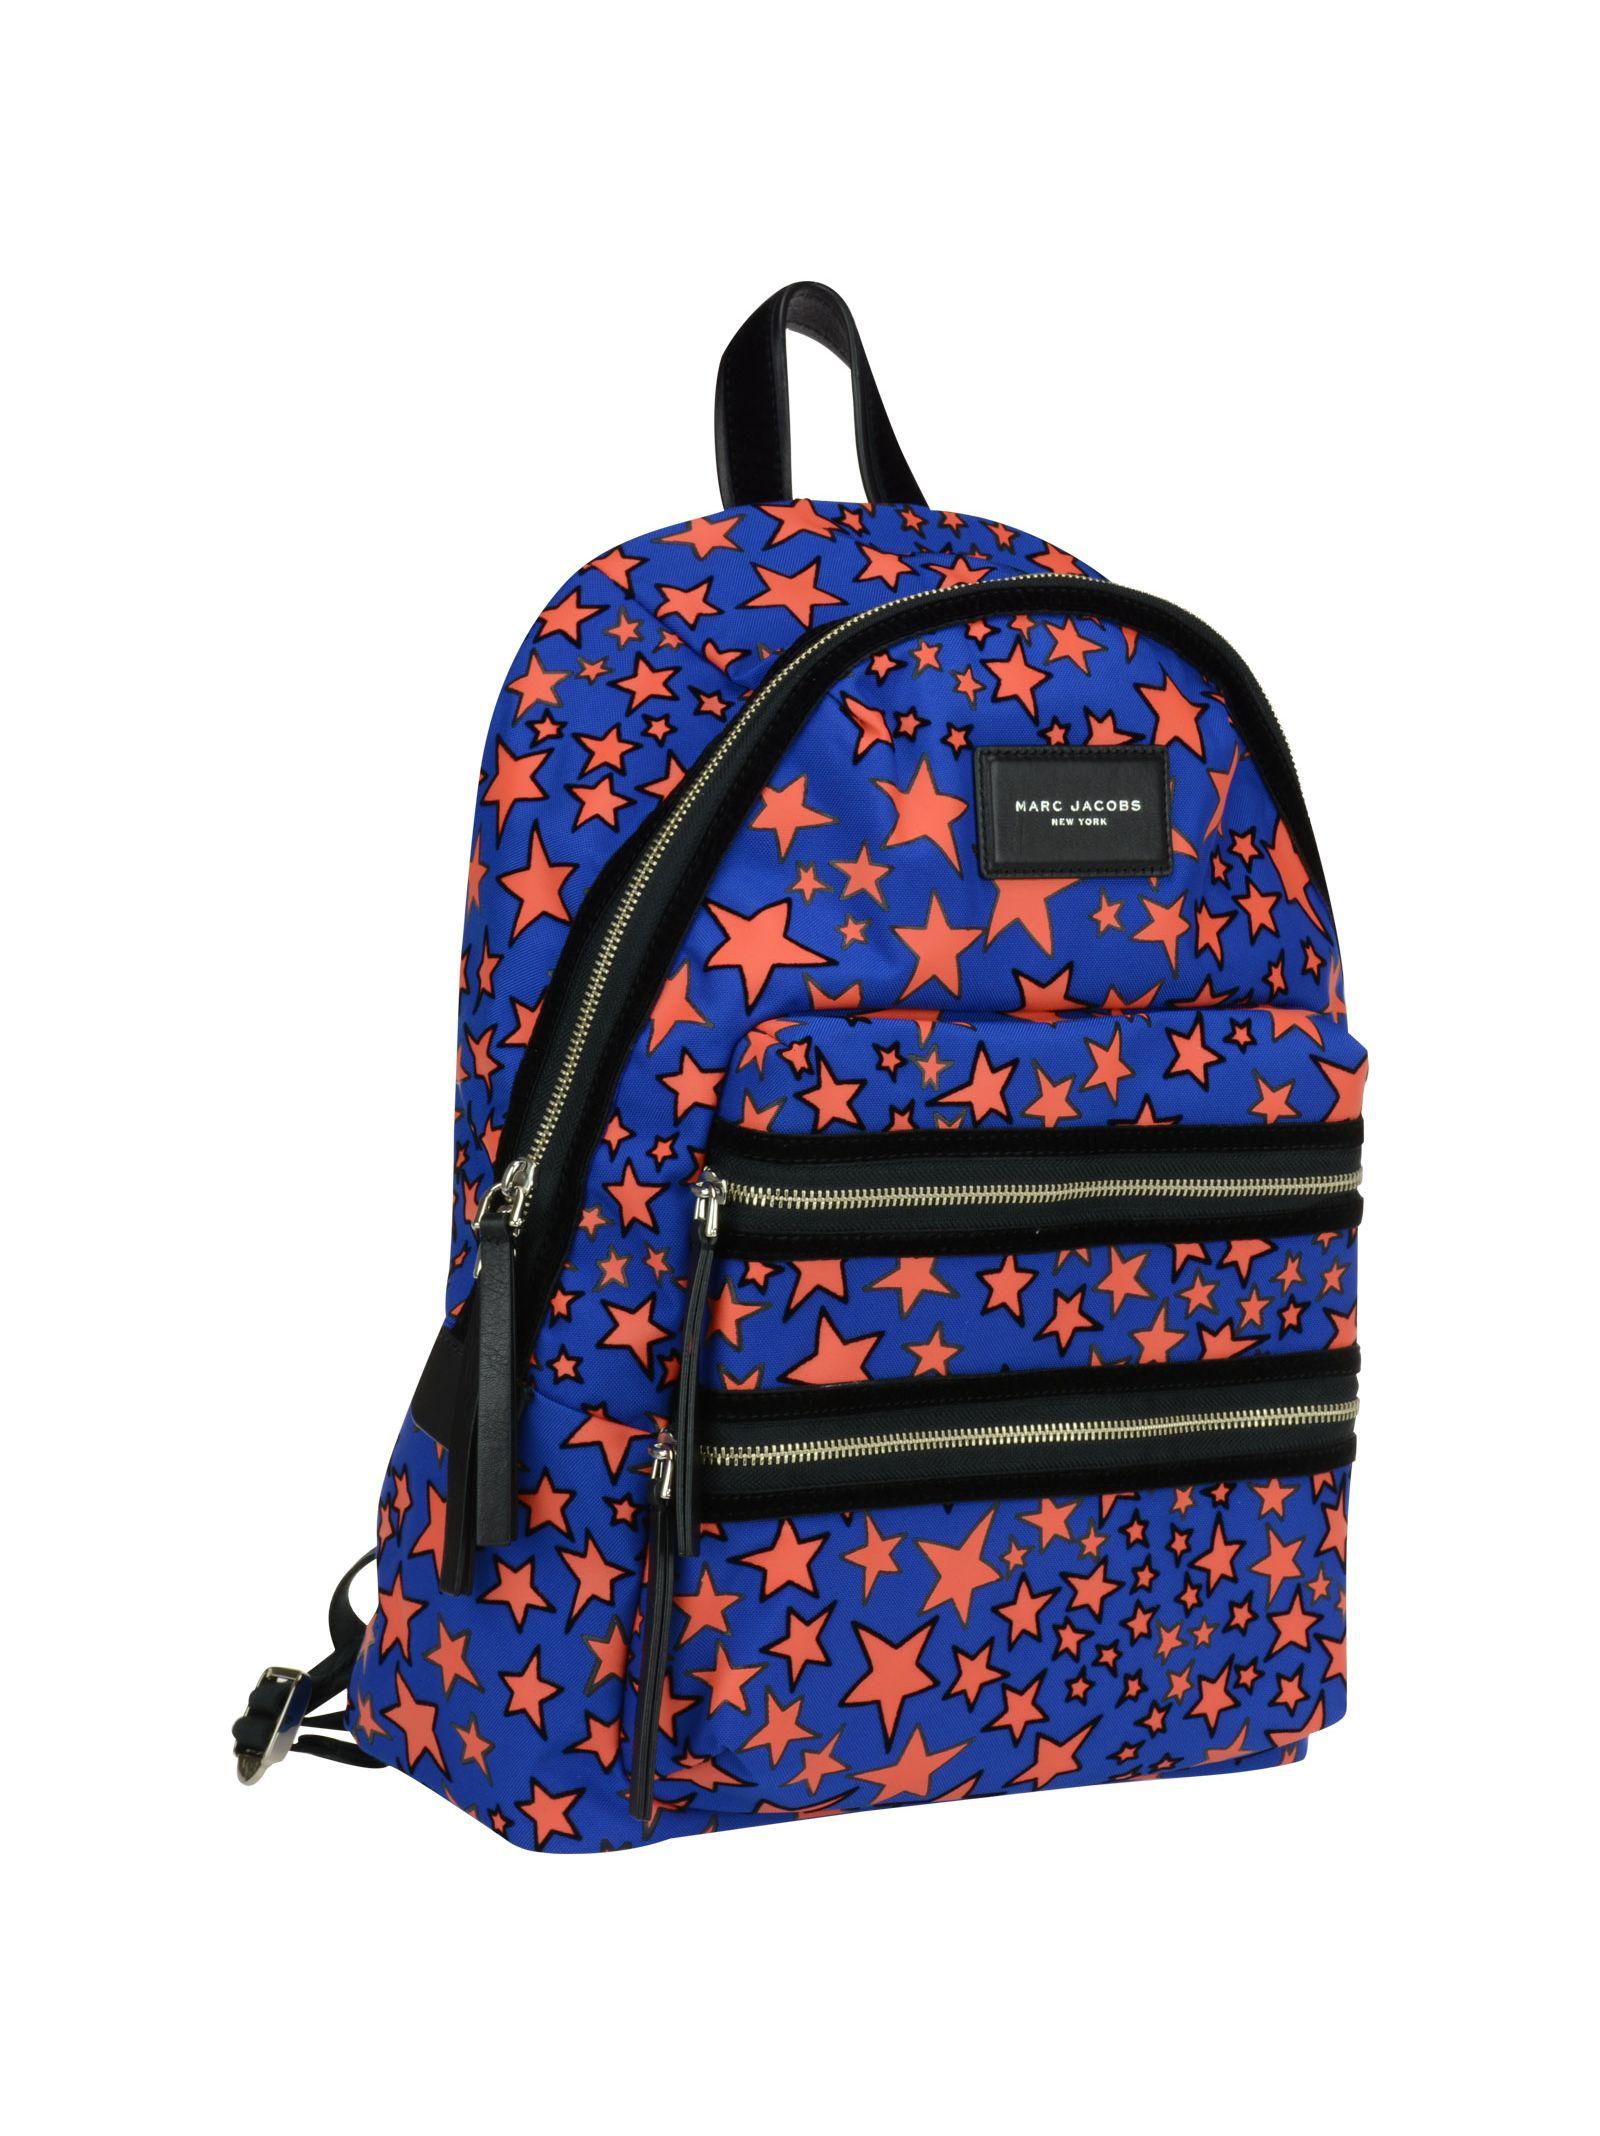 marc jacobs female 201920 marc jacobs flocked stars backpack